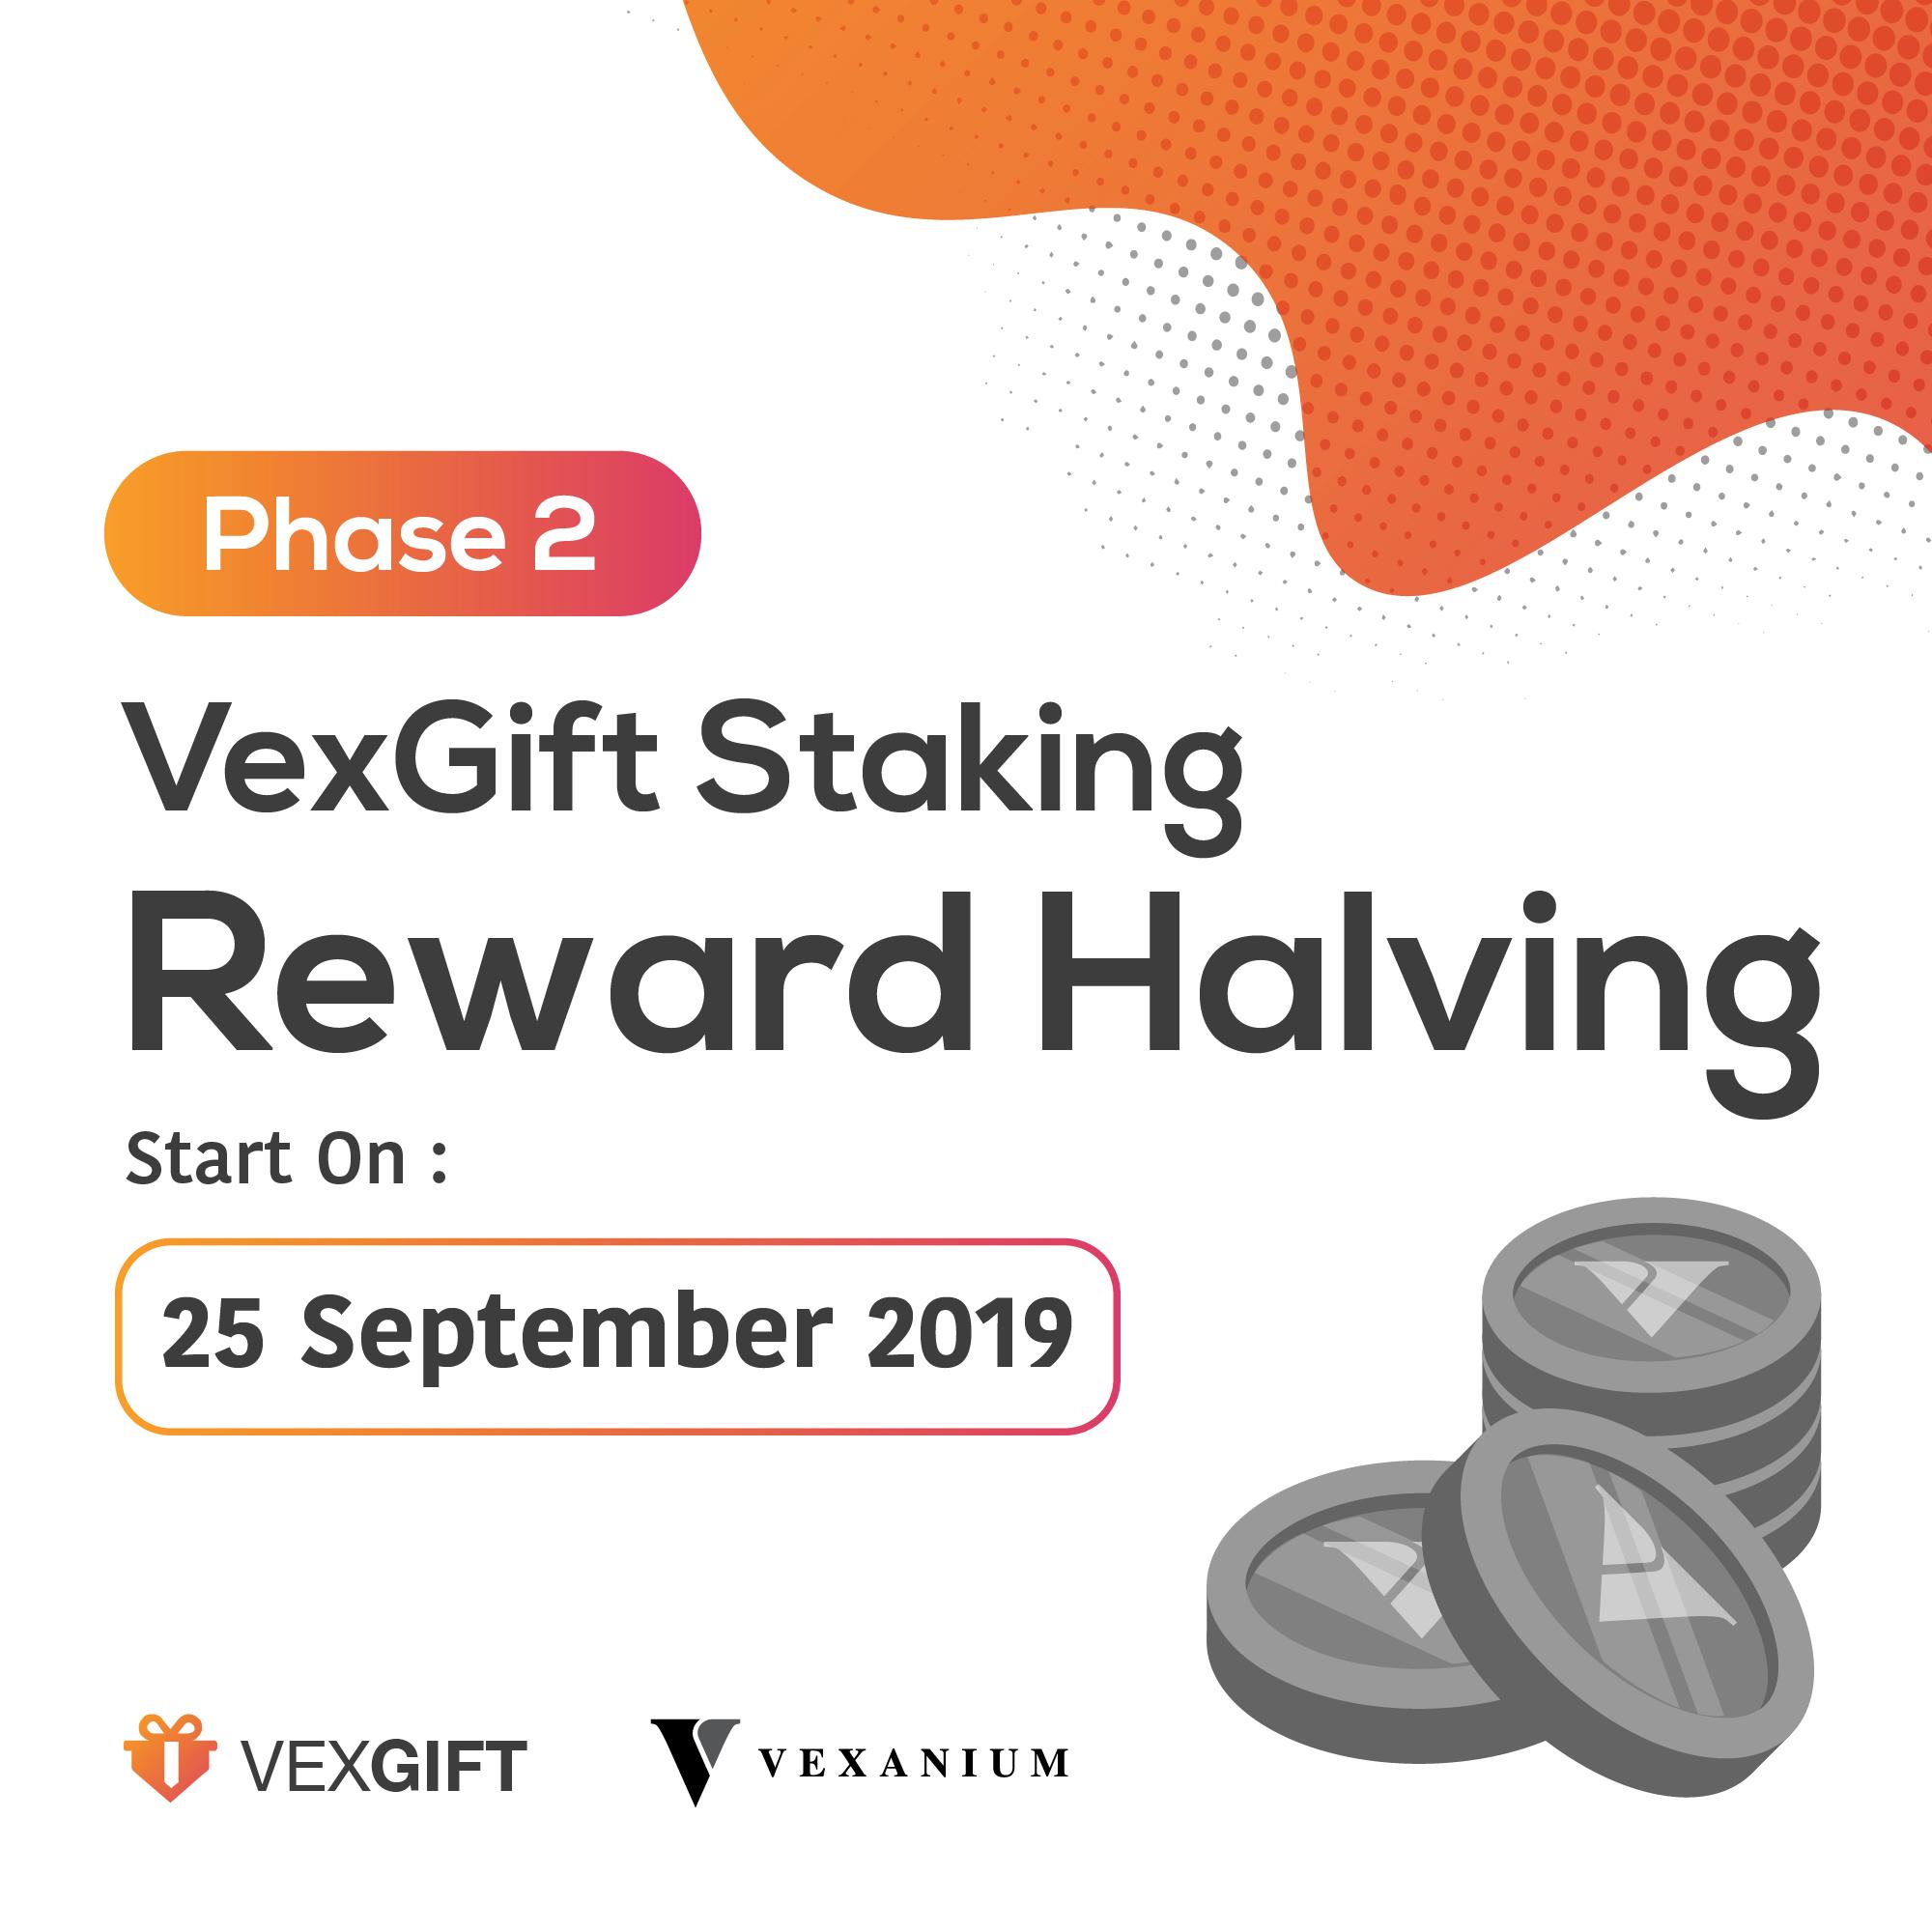 VexGift Staking Reward Halving Phase 2 Announcement